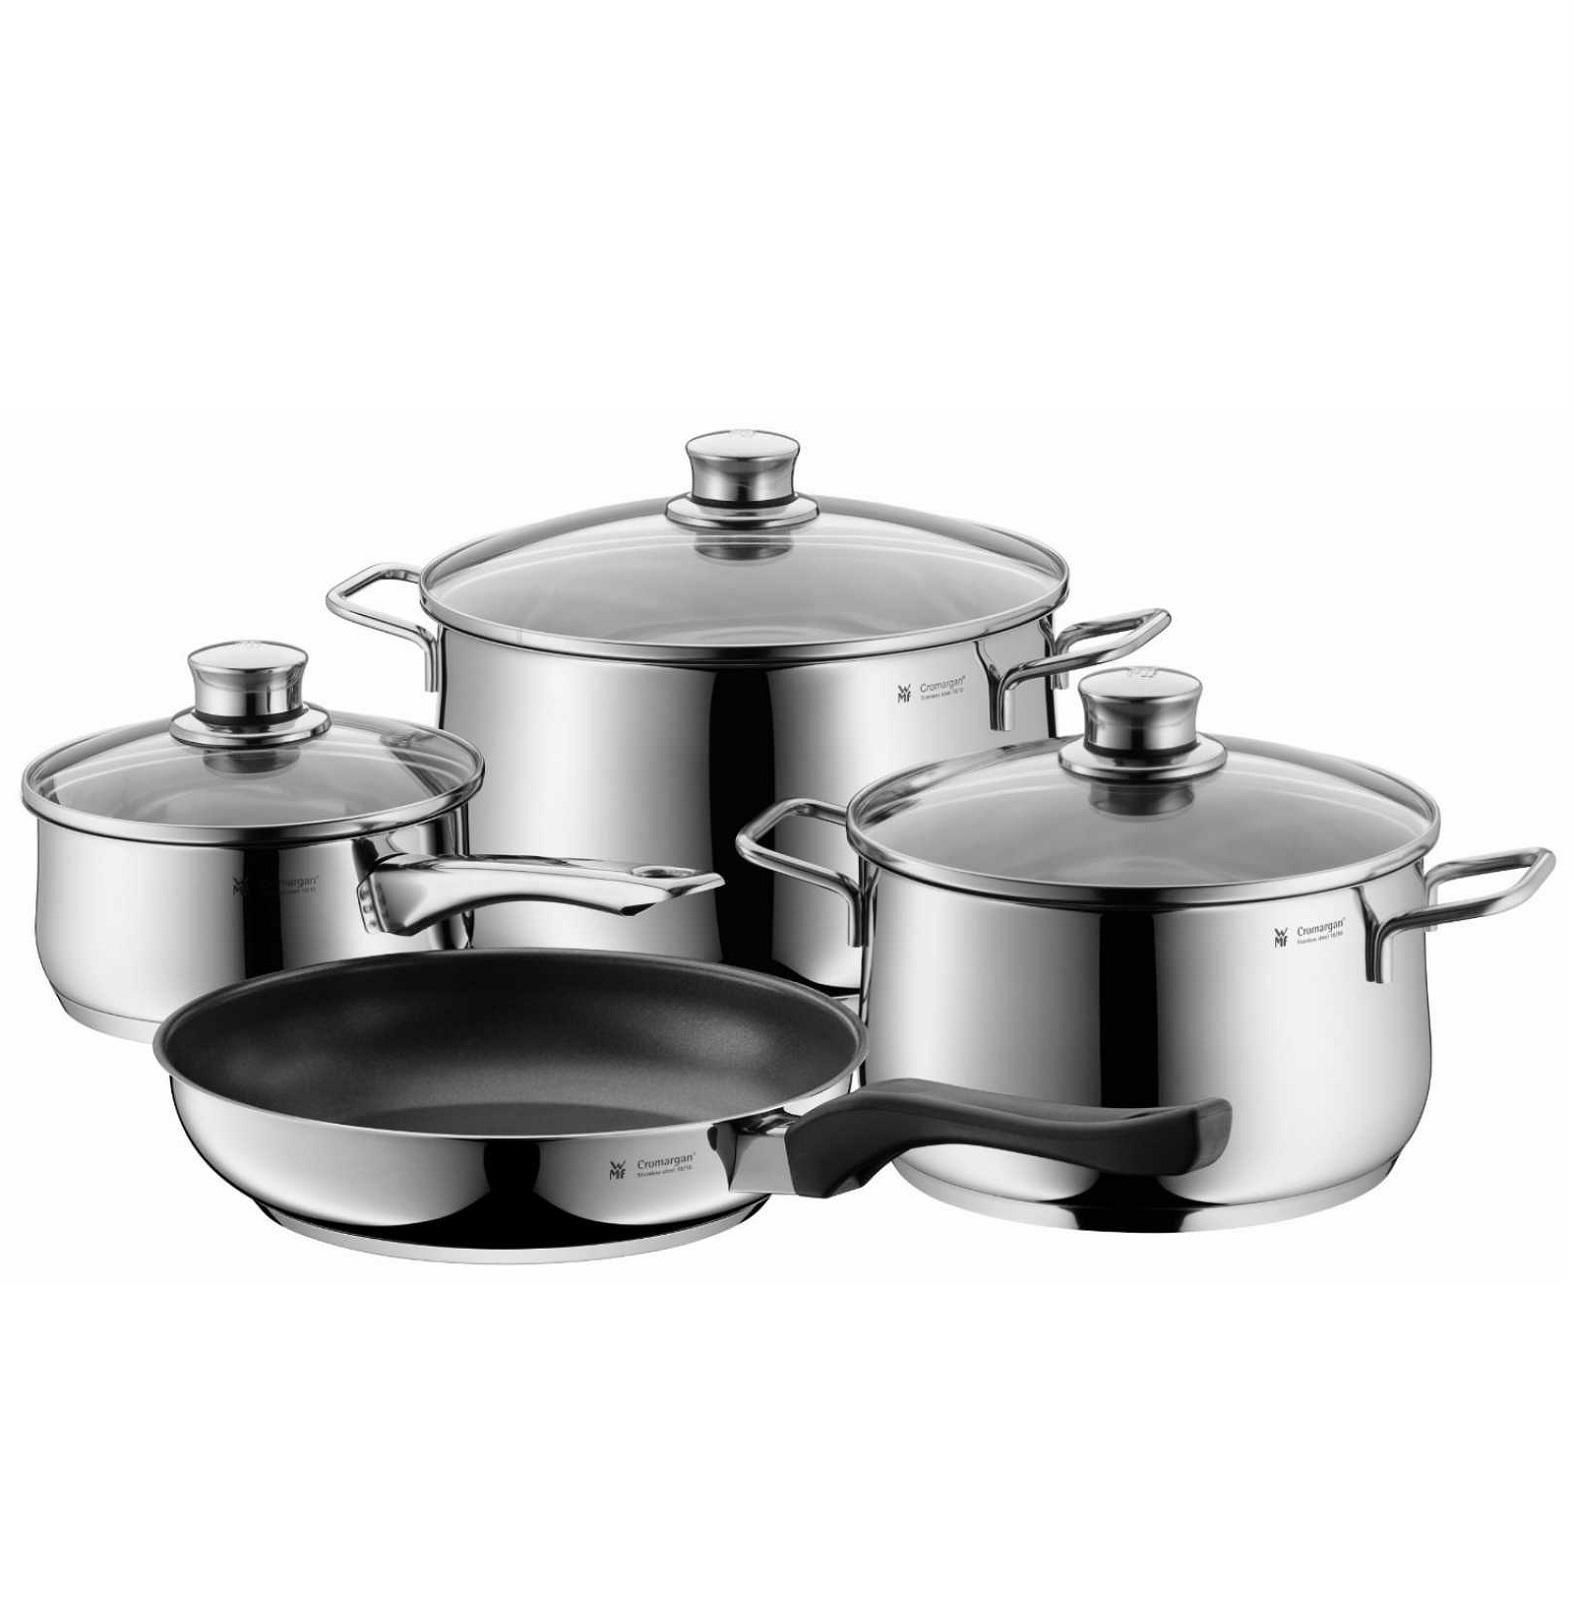 Онлайн каталог PROMENU: Набор кухонной посуды WMF DIADEM PLUS, кастрюля: 20 см х 3,5 л; 24 см х 6 л; ковш: 16 см х 1,5 л; сковорода 24 см, серебристый, 4 предмета WMF 07 3027 6040 PROMO